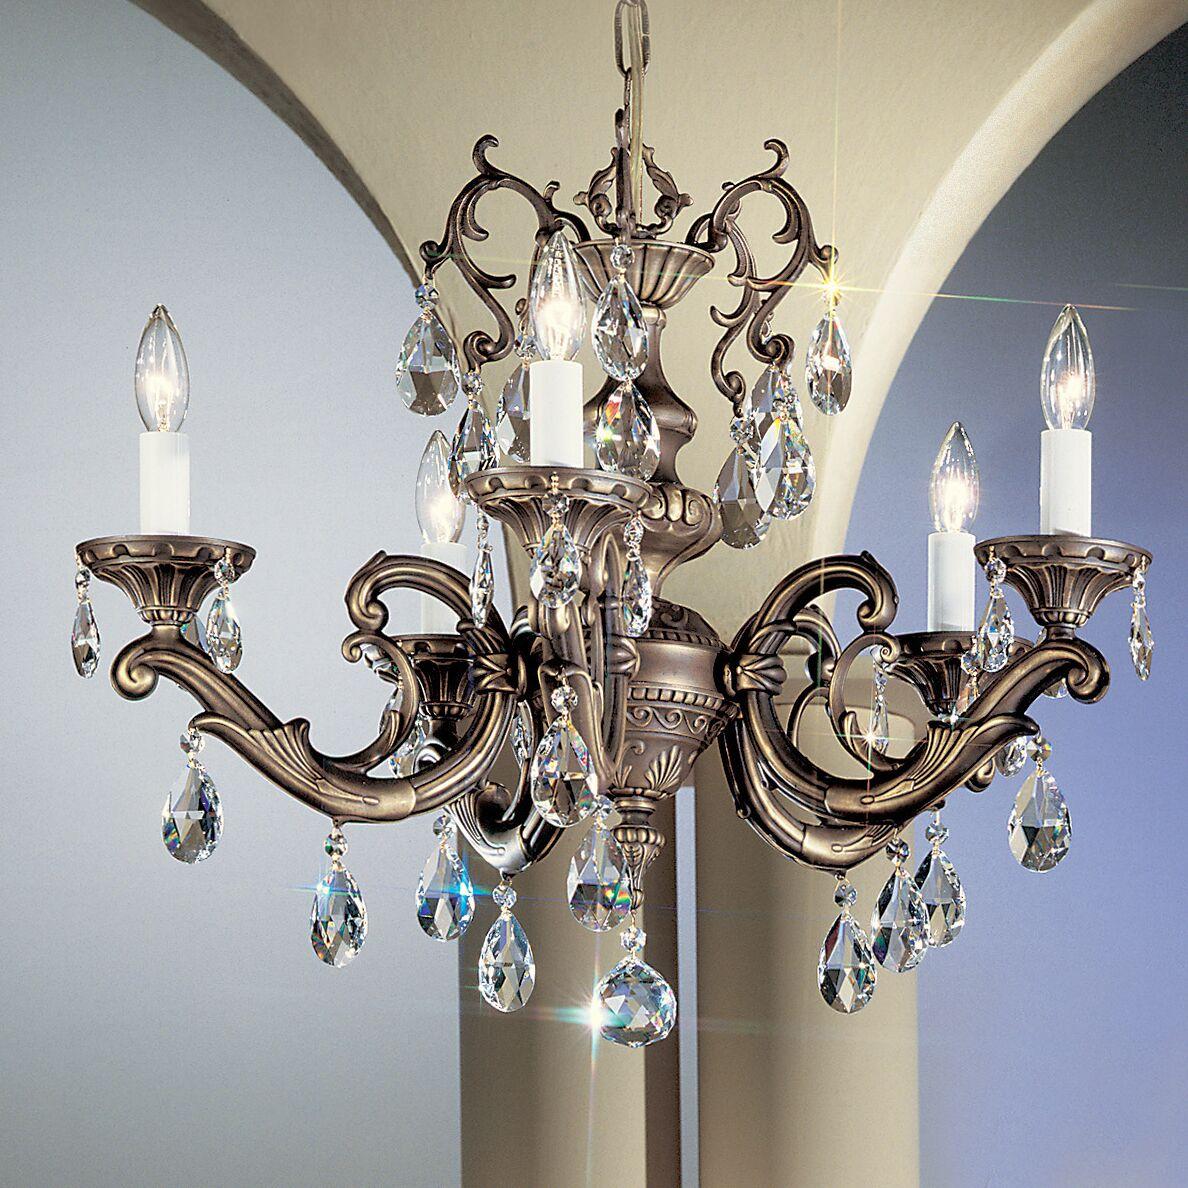 Princeton II 5-Light Candle Style Chandelier Finish: Millenium Silver, Crystal Type: Swarovski Elements